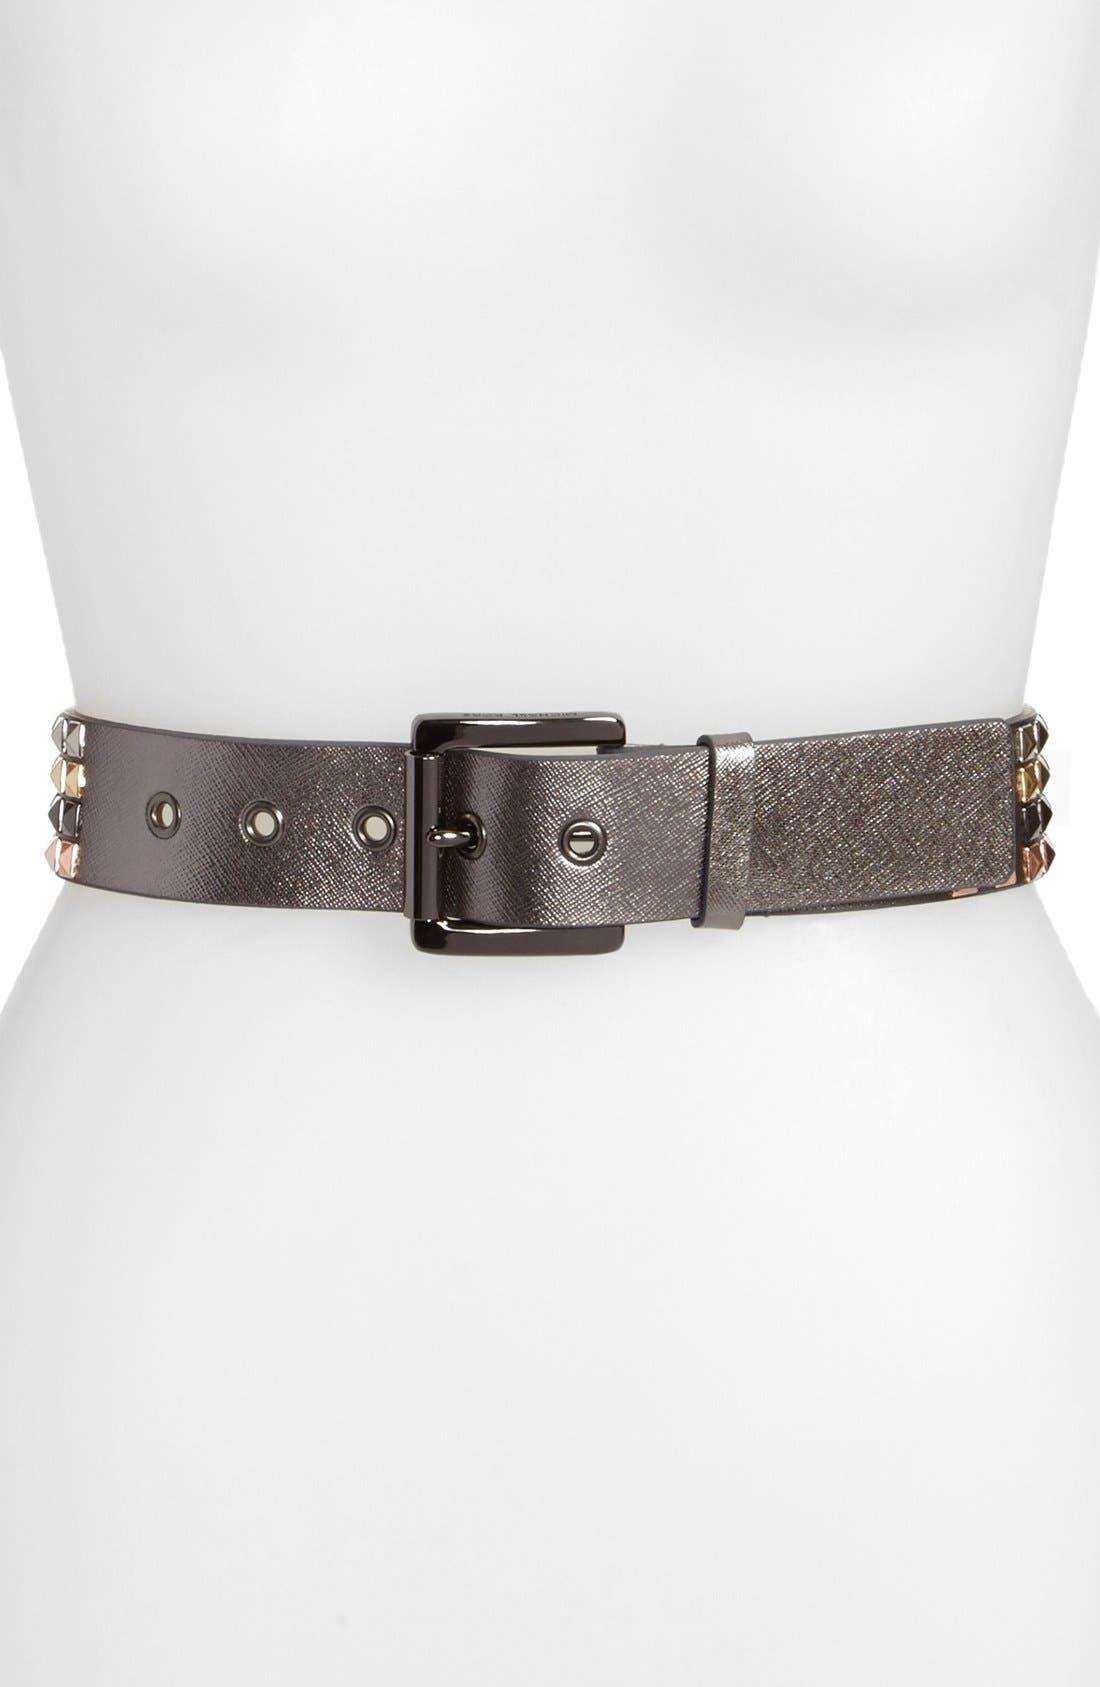 Alternate Image 1 Selected - MICHAEL Michael Kors Pyramid Studded Metallic Saffiano Leather Belt